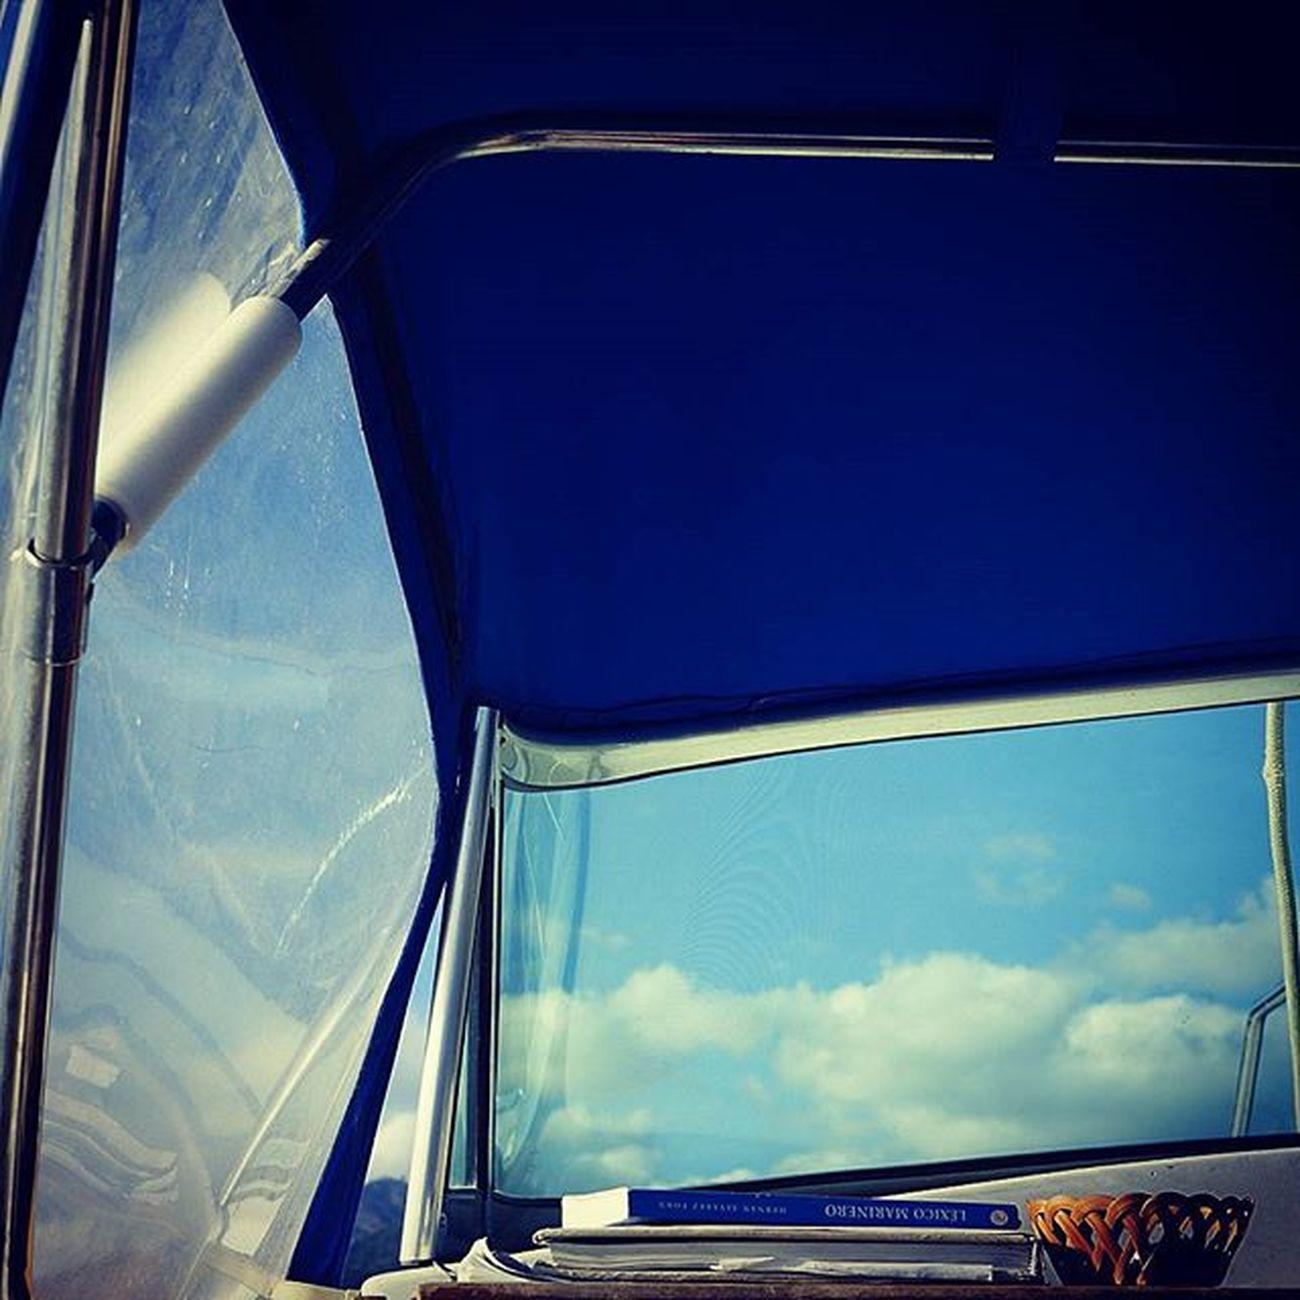 Rustlord_archdesign Bestoftheday Beachday Sailing Sailboat Ig_bestpics Ig_bestshotz Ig_bestever Igphotooftheday Travel Travelling Ig_naturelovers Archilovers Architecture Exploring Explore Dream Dreams Bestoftheday